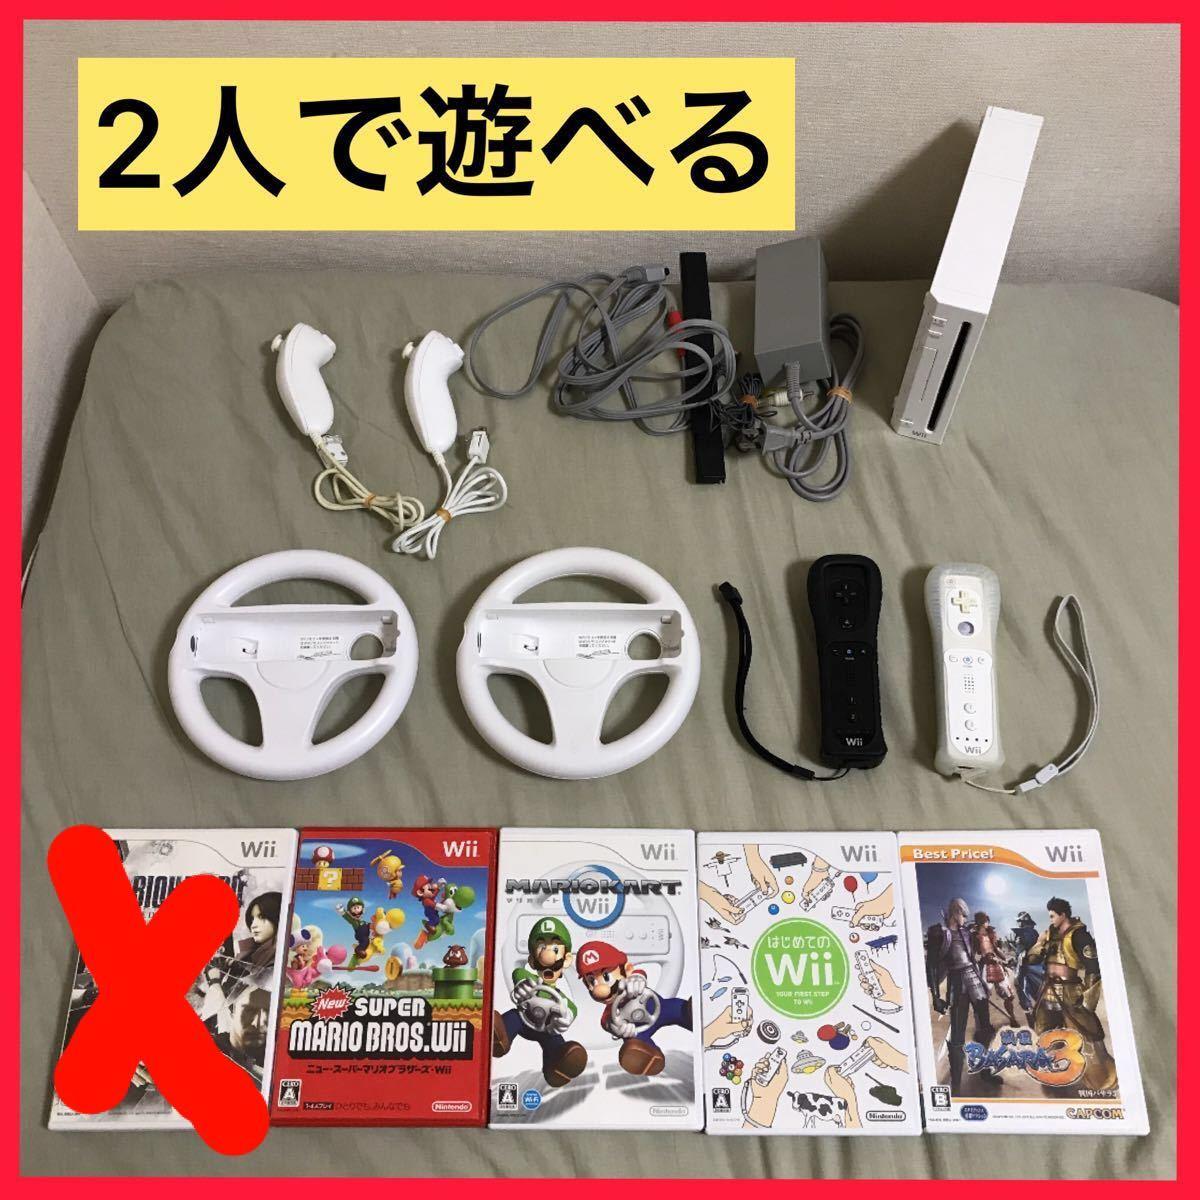 Wii本体マリオカート 2人で遊べるセット